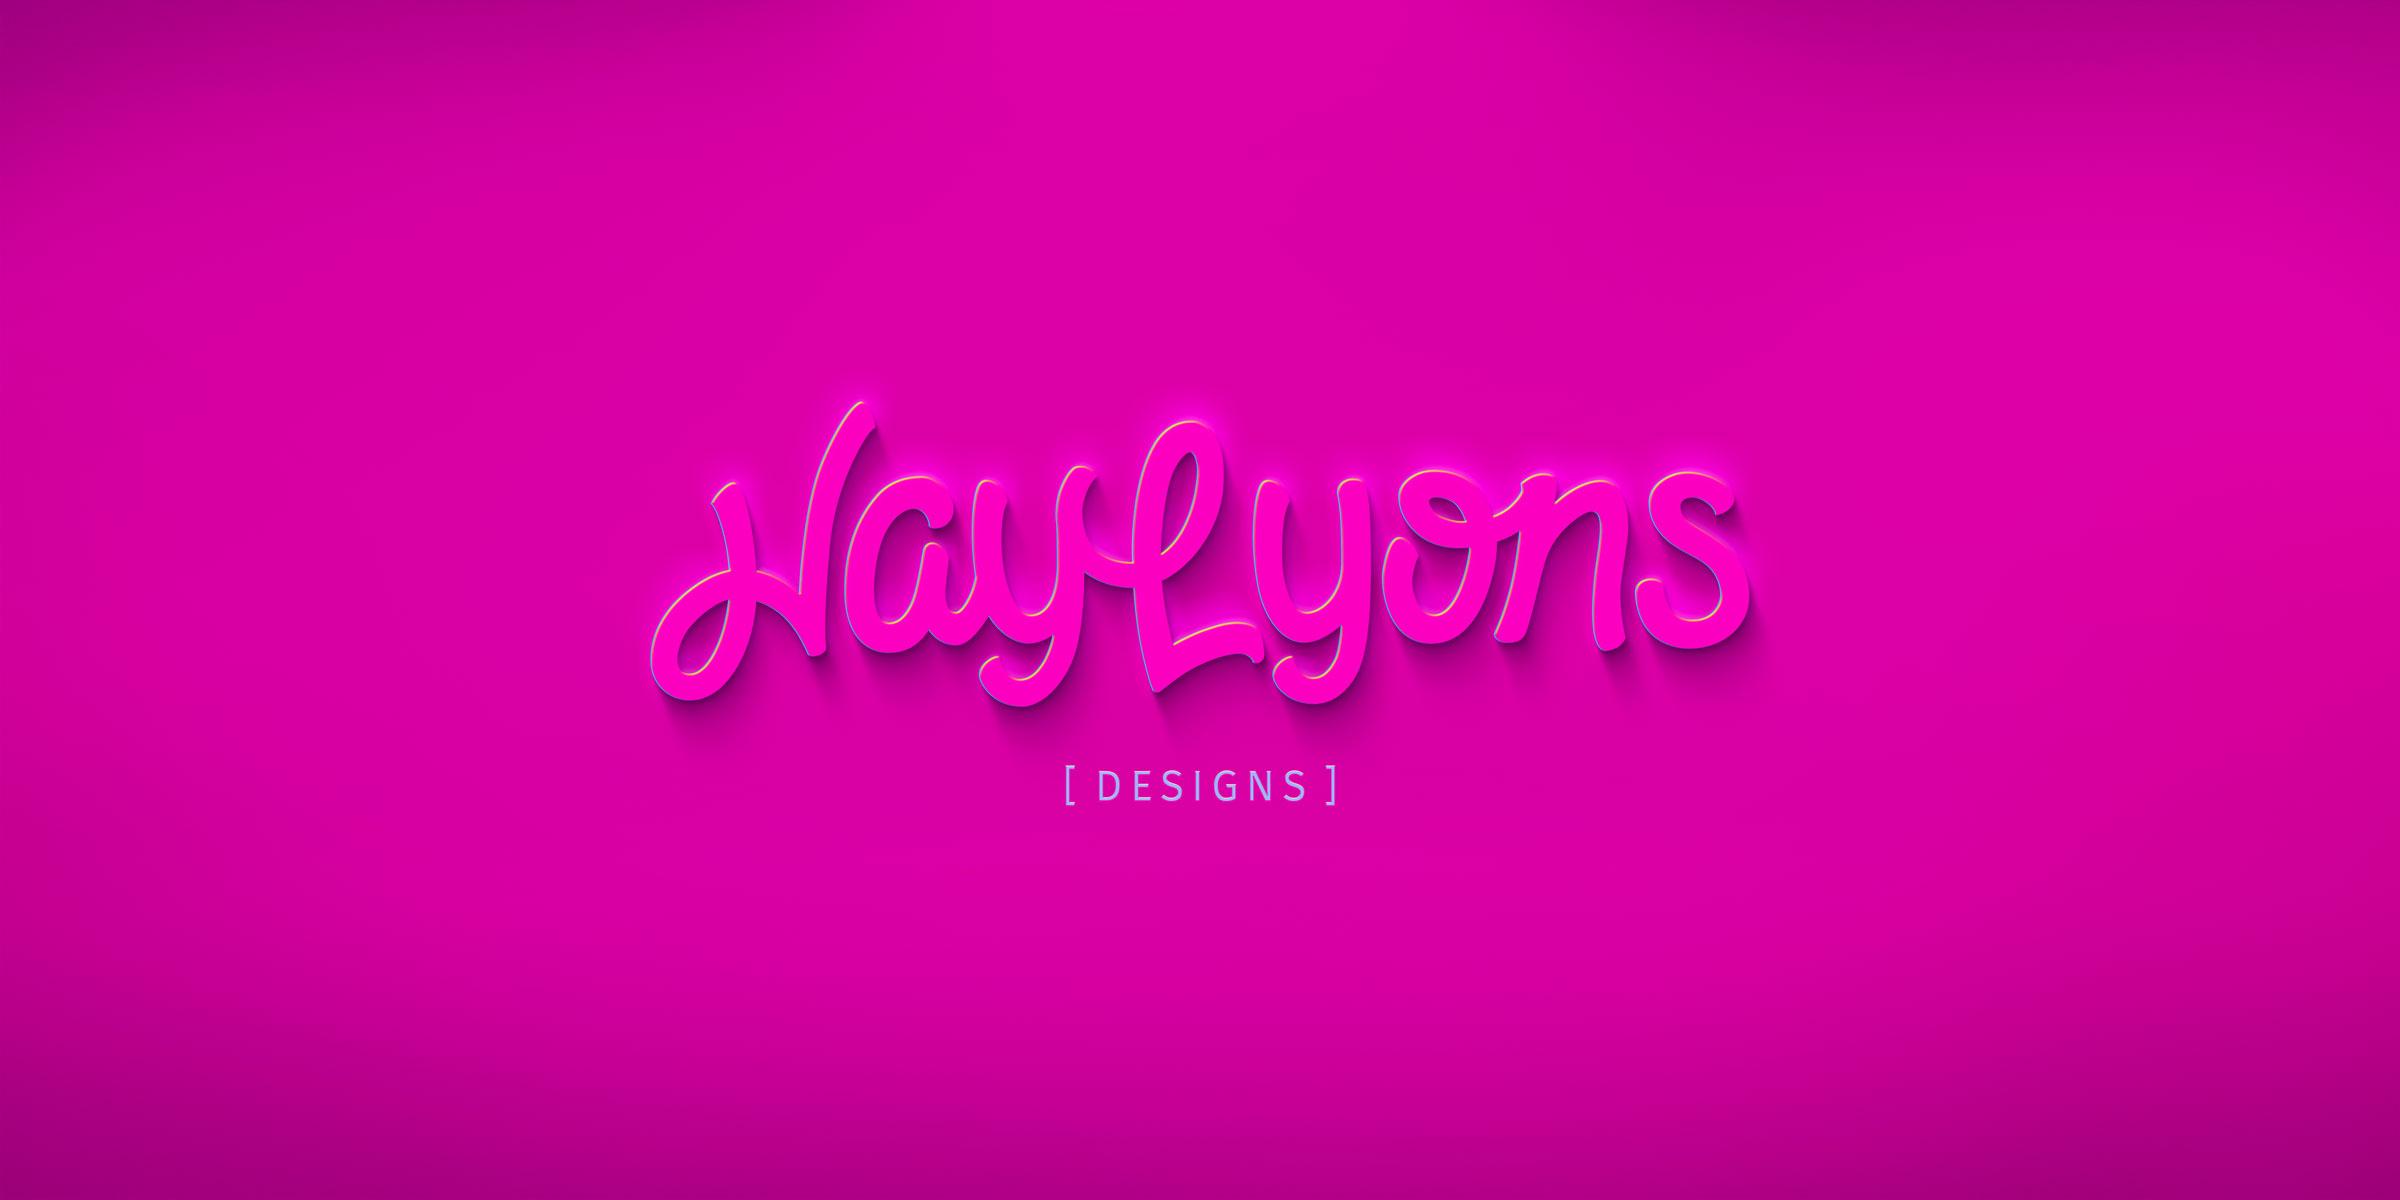 haylyons_3